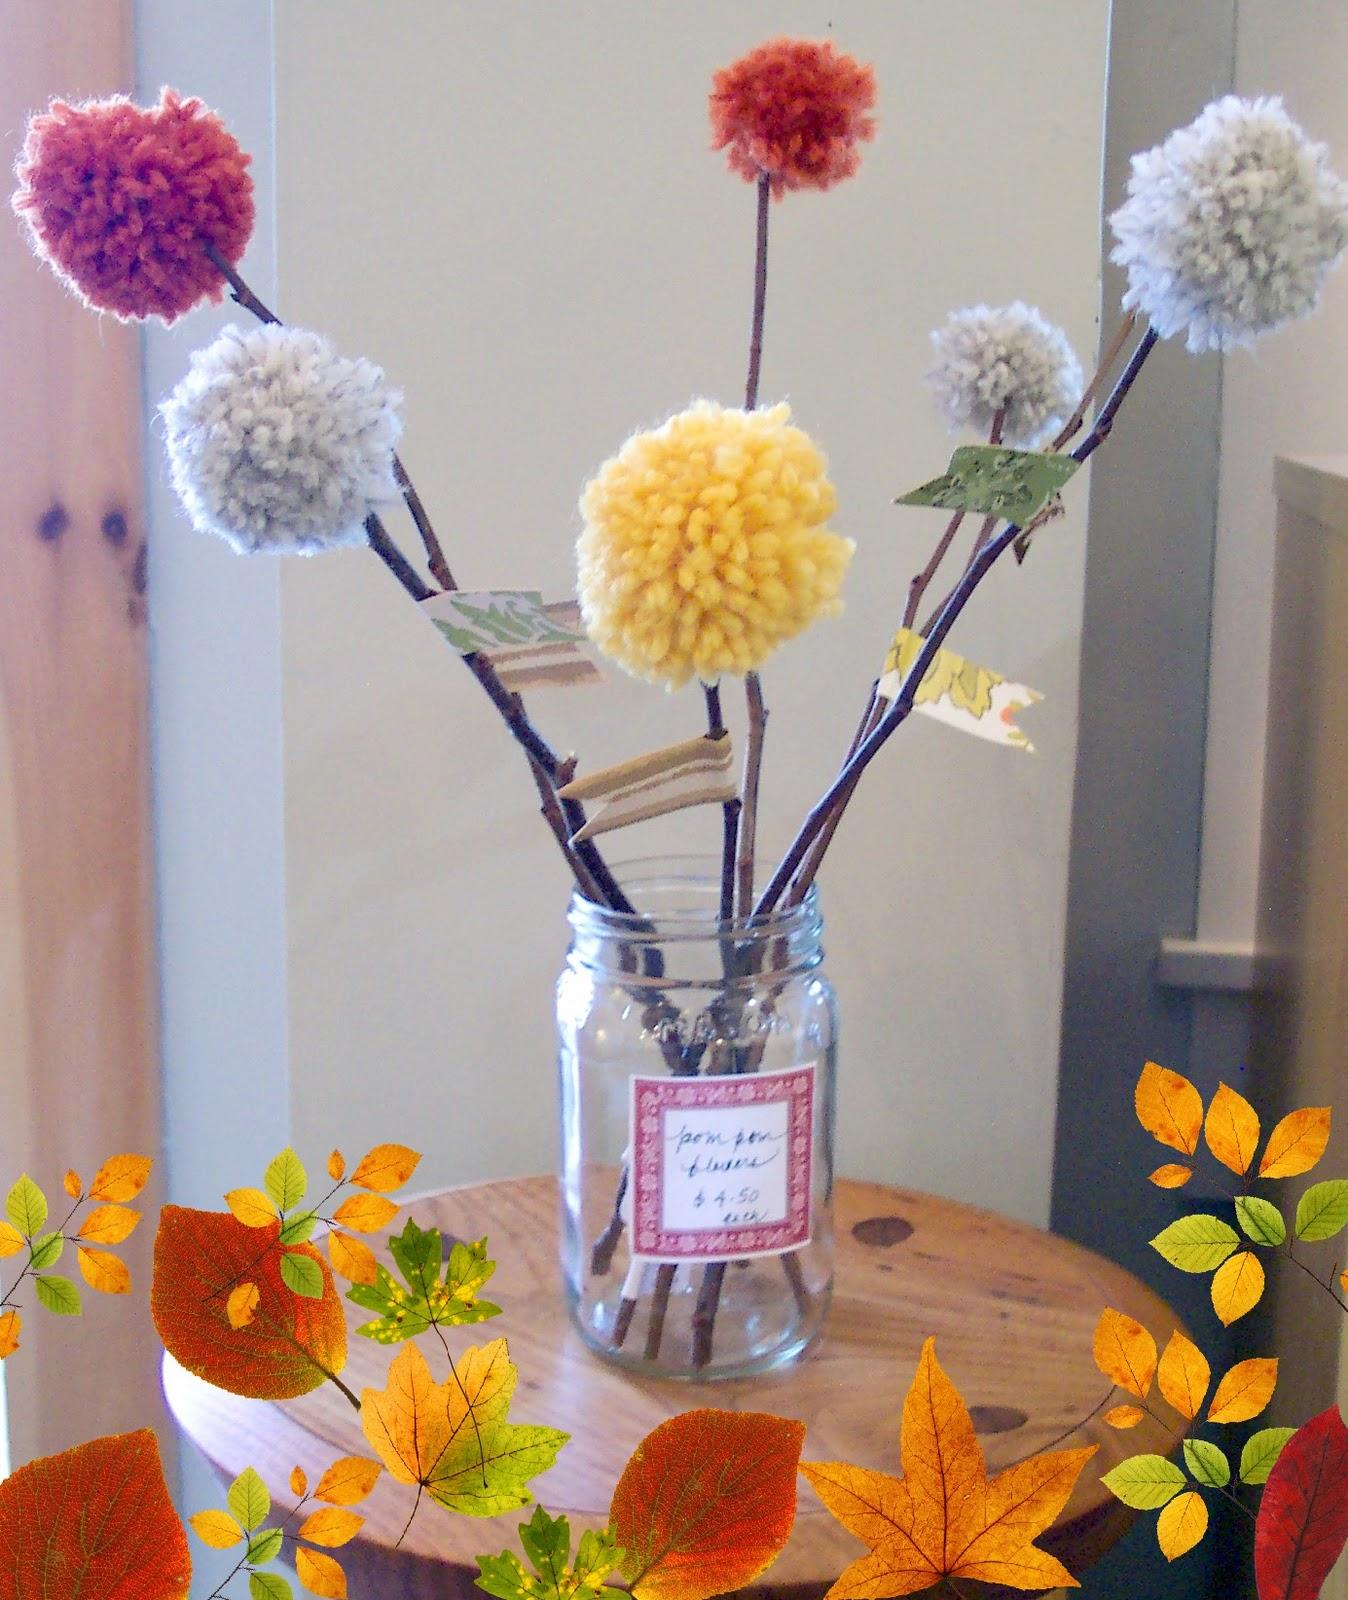 http://4.bp.blogspot.com/-6aj8A68czaI/TpmUFLjpzpI/AAAAAAAACGg/3yIkQCMK-TE/s1600/pom+pom+flowers.jpg